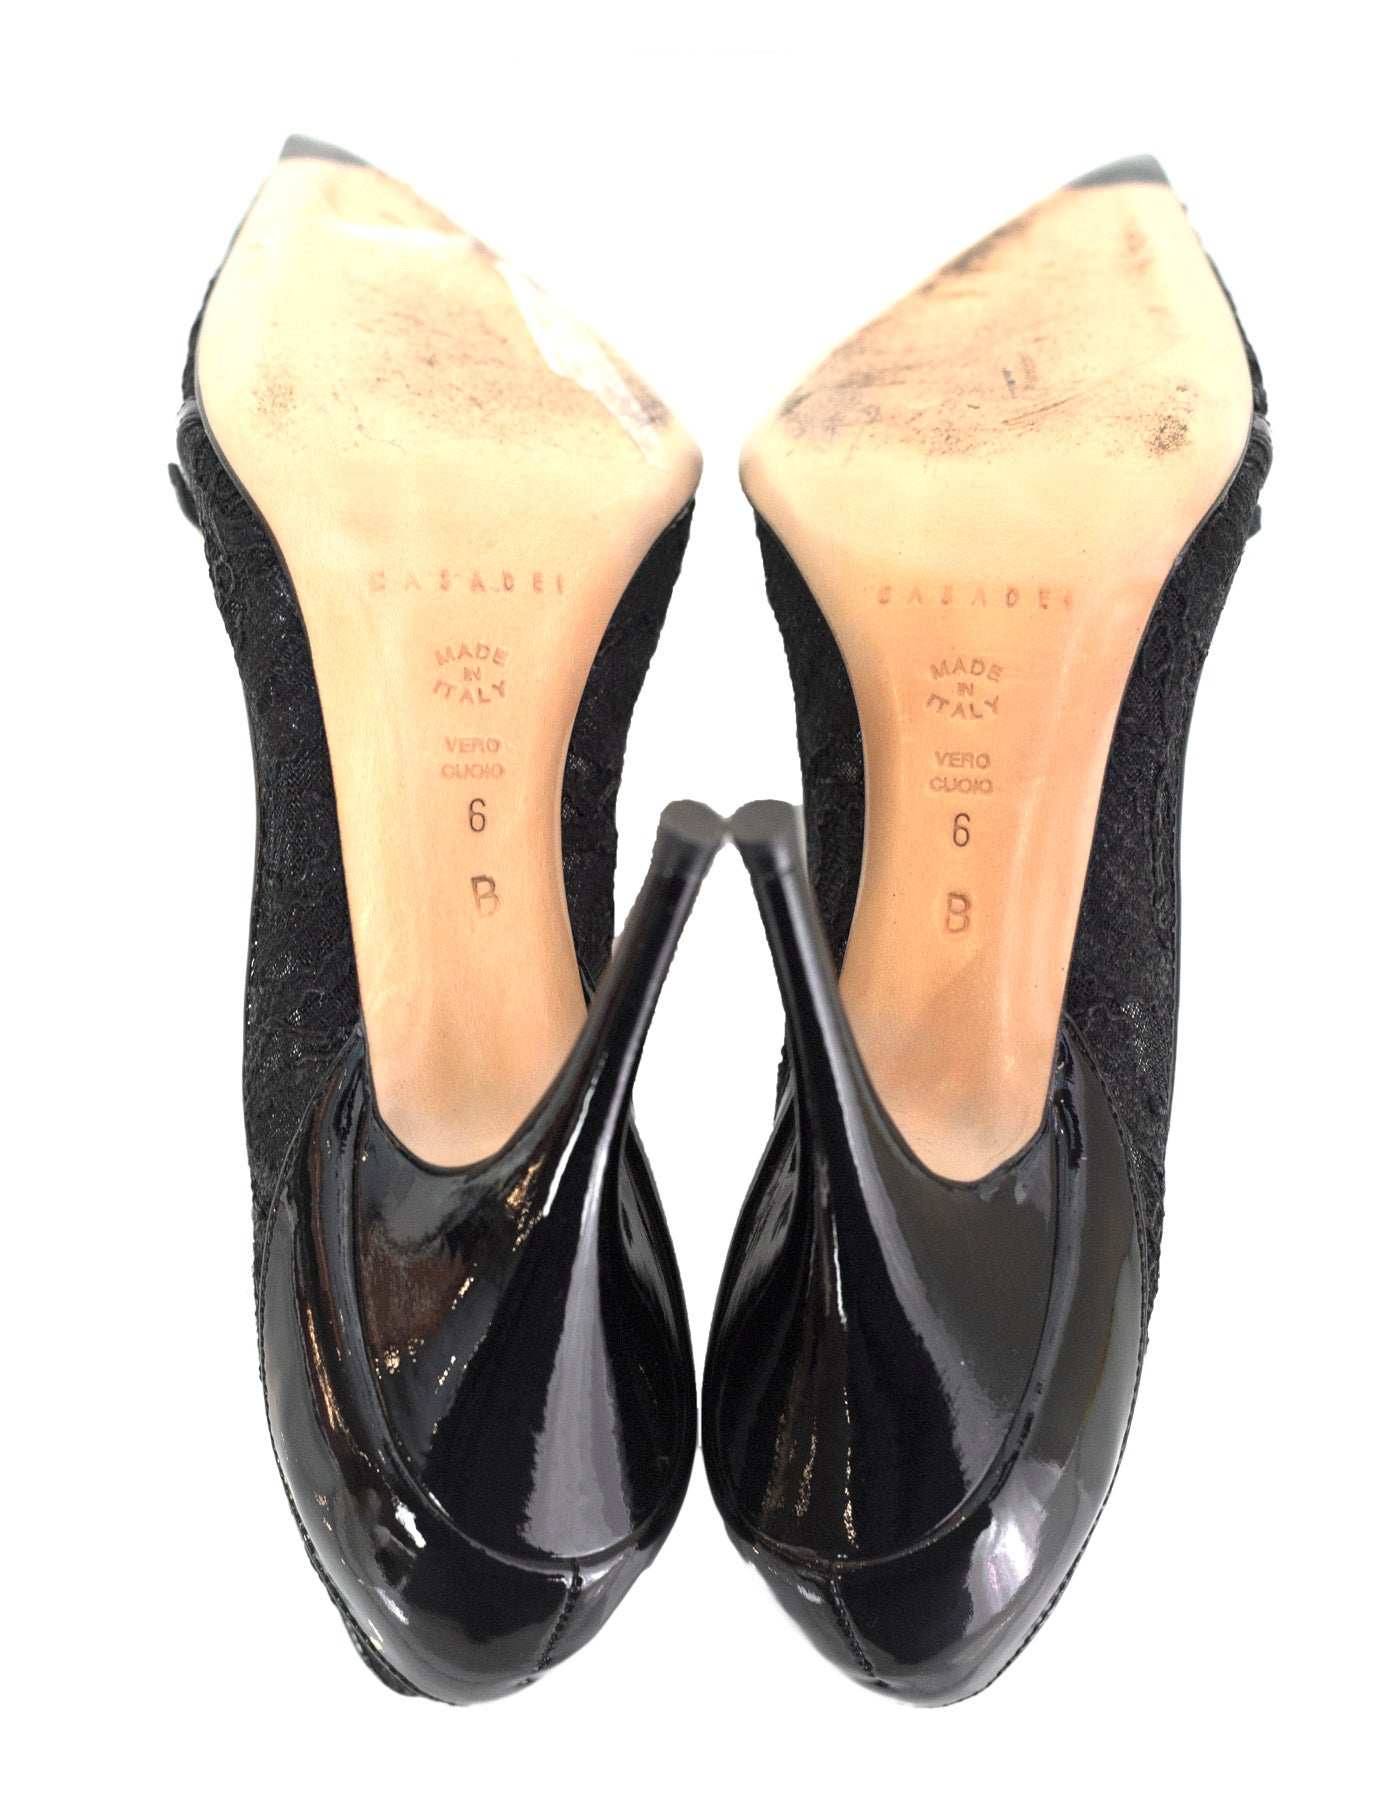 2ba8861a7 Casadei Black Lace Pumps Sz 6 For Sale at 1stdibs